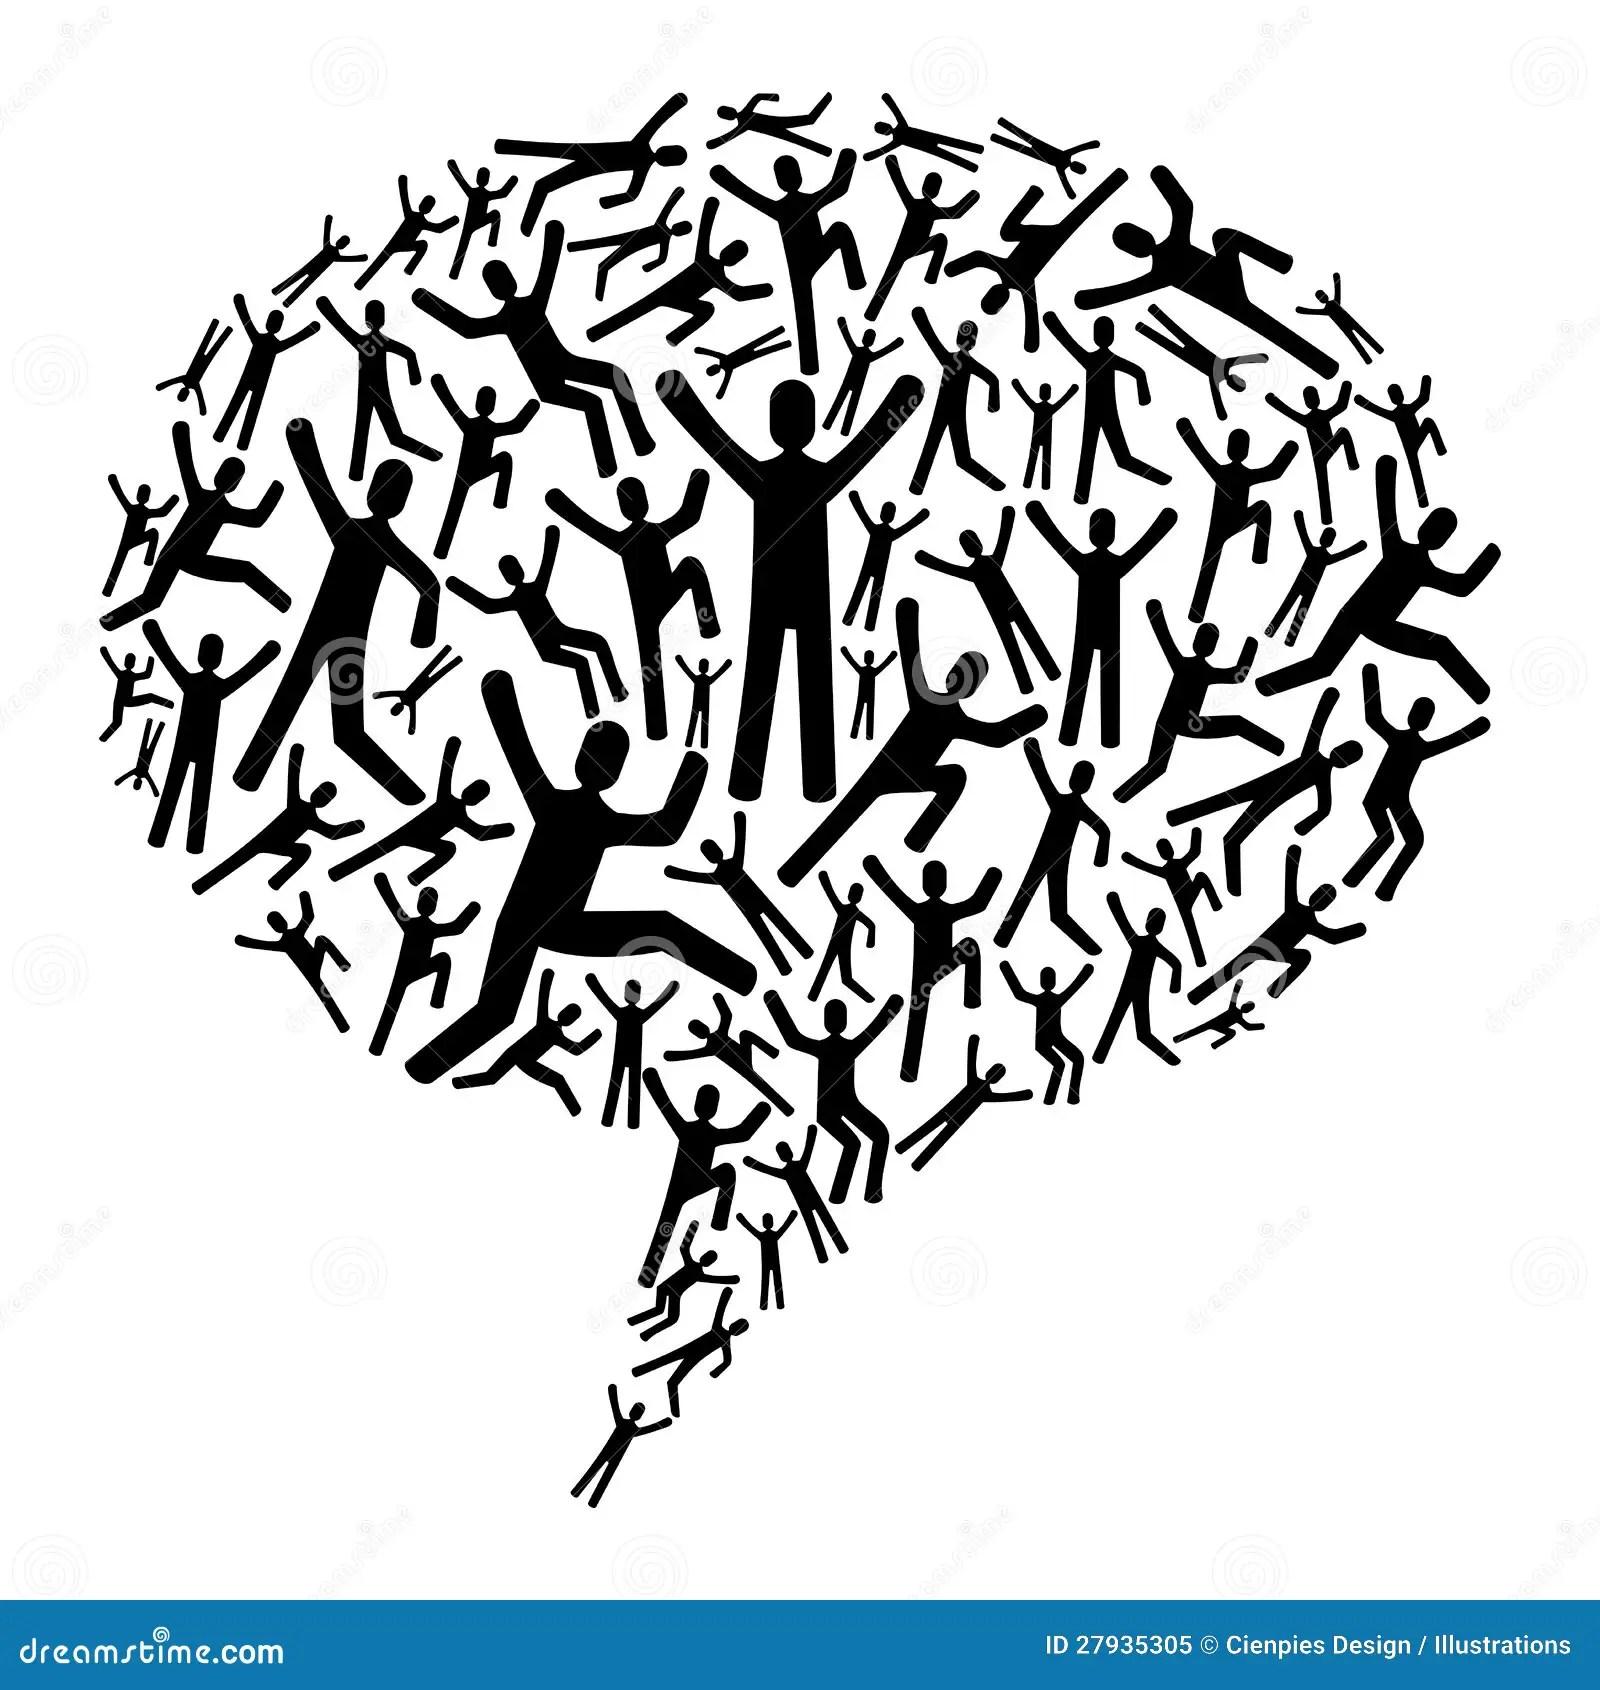 Diversity social people stock vector. Illustration of